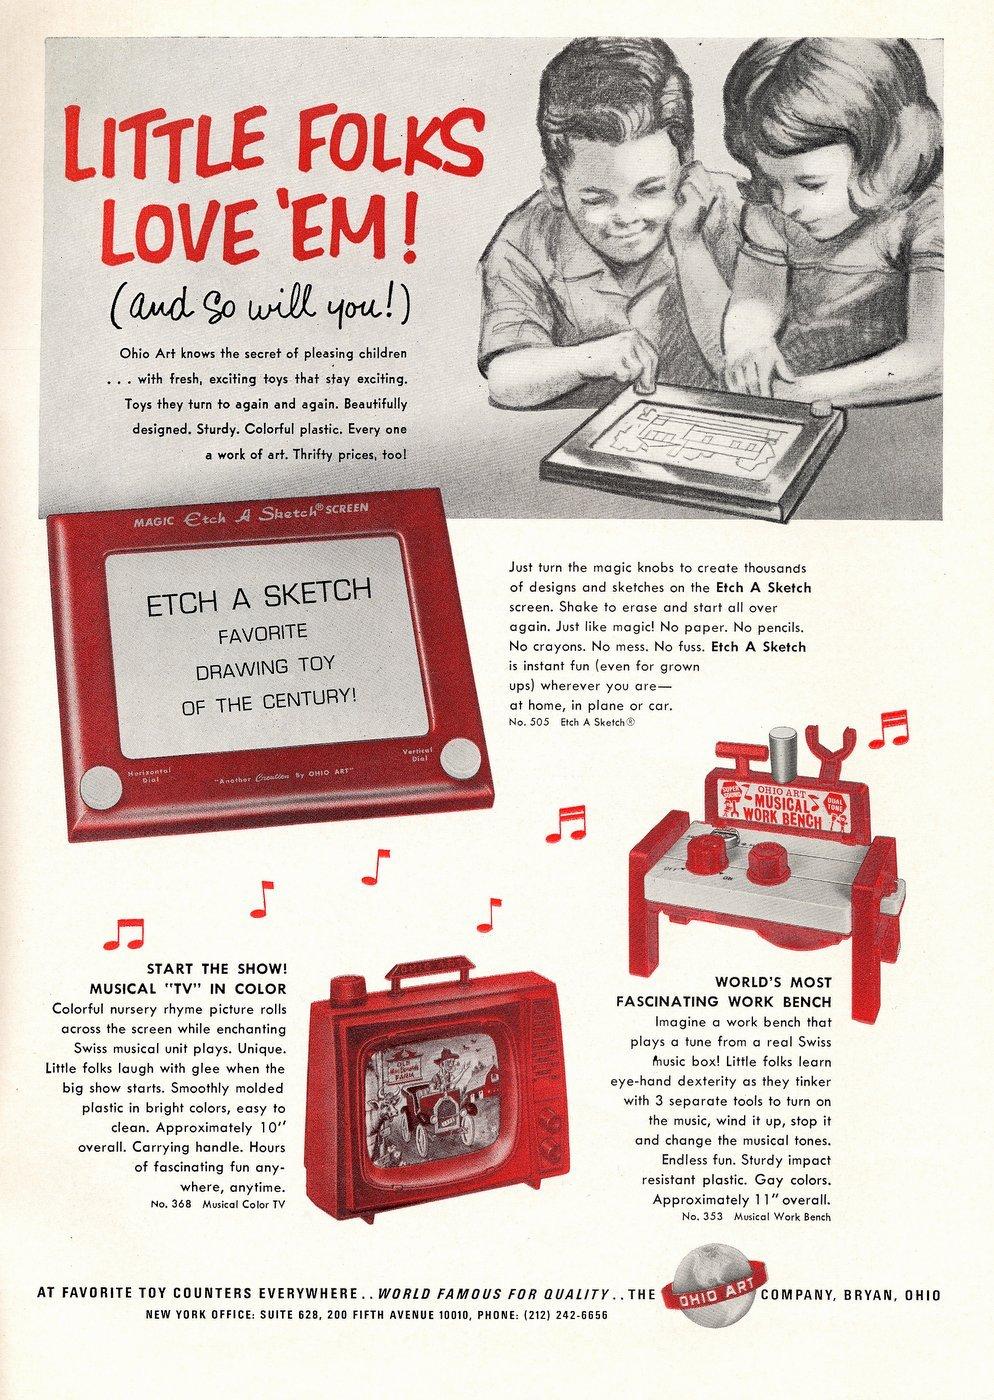 Old-fashioned Etch A Sketch toys - Ohio Arts 1967 (3)